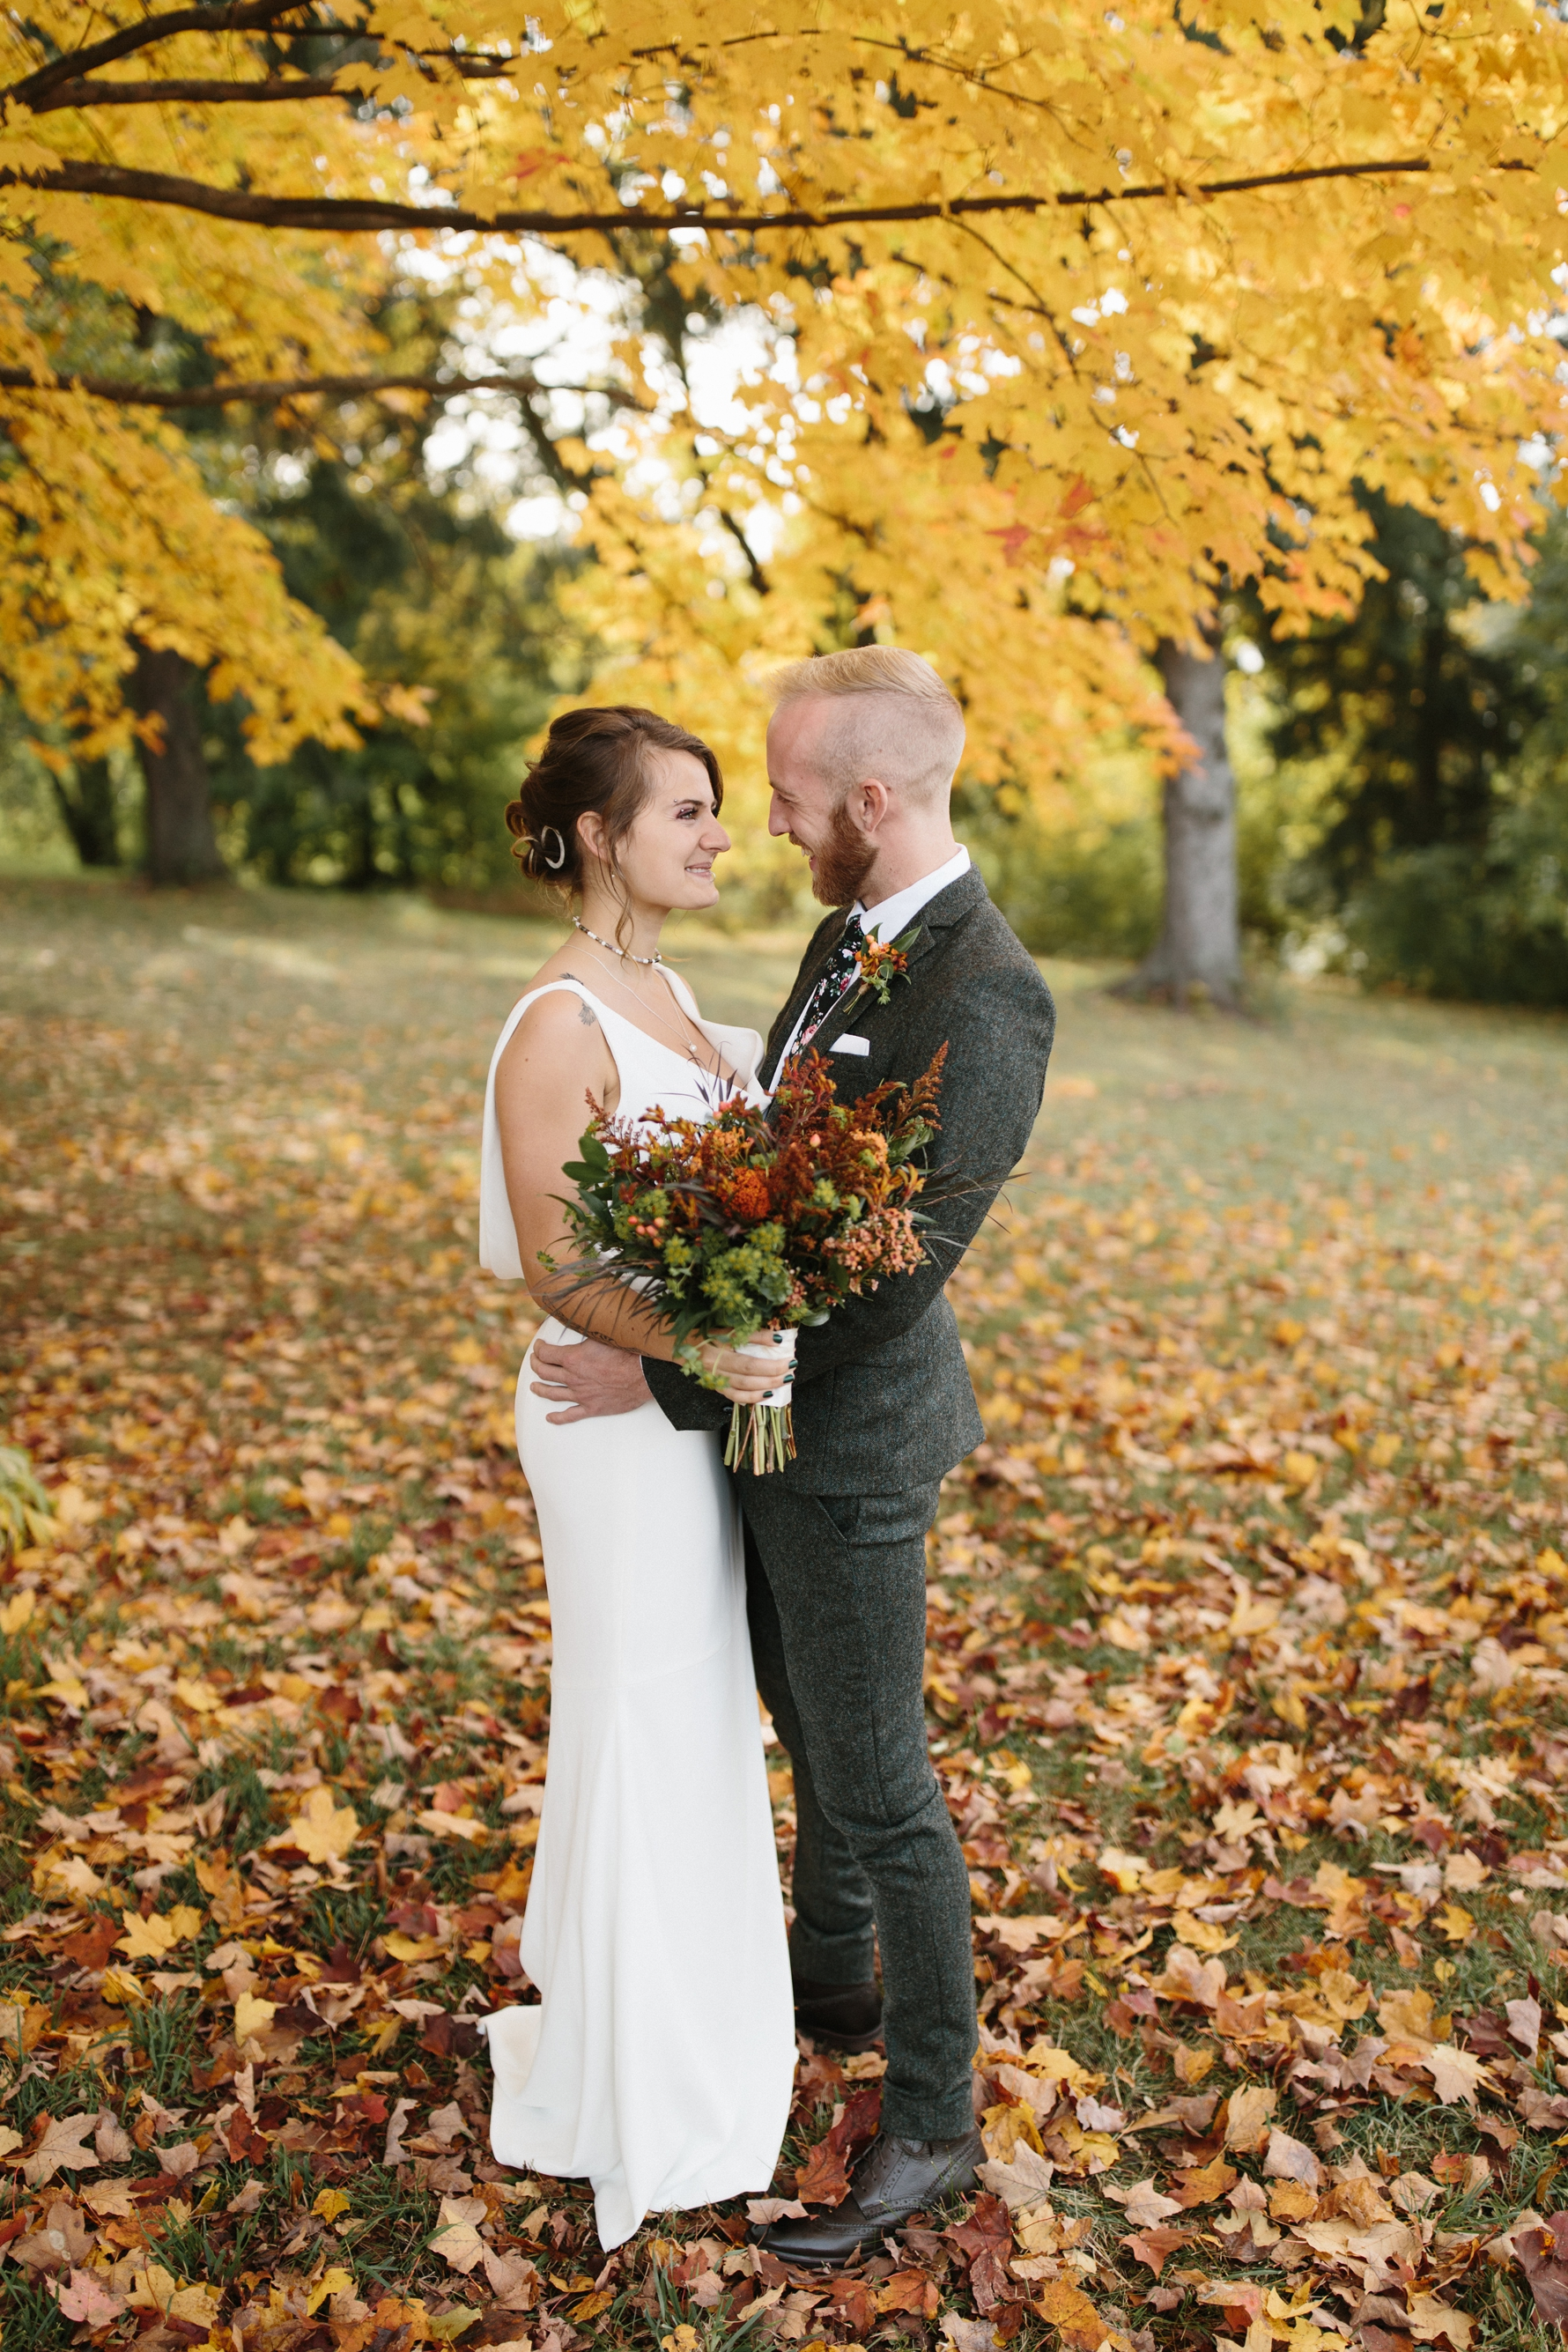 norris-traverse-city-wedding-27.JPG